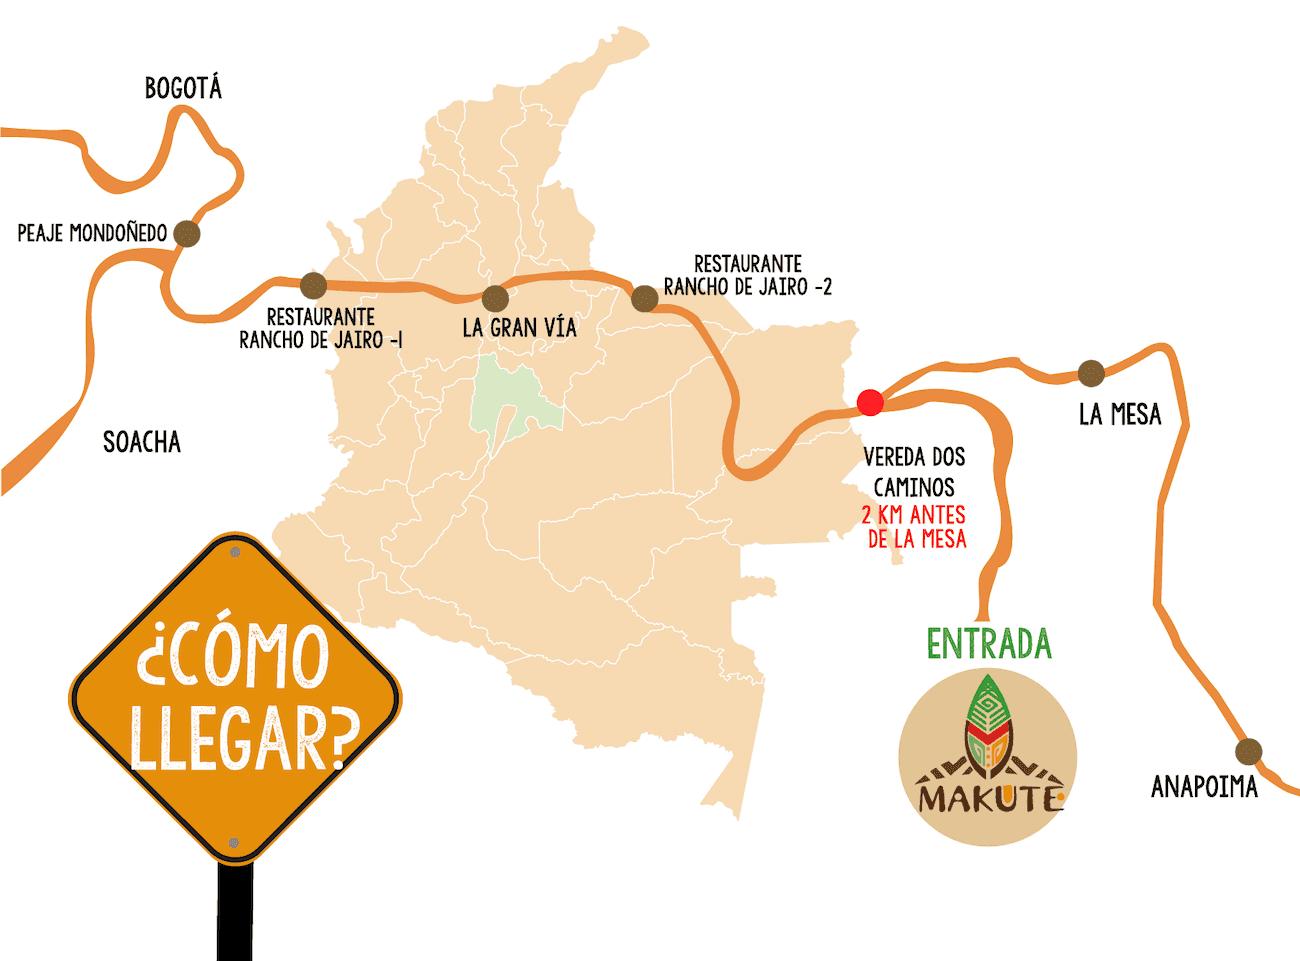 Mapa Como Llegar Parque Makute